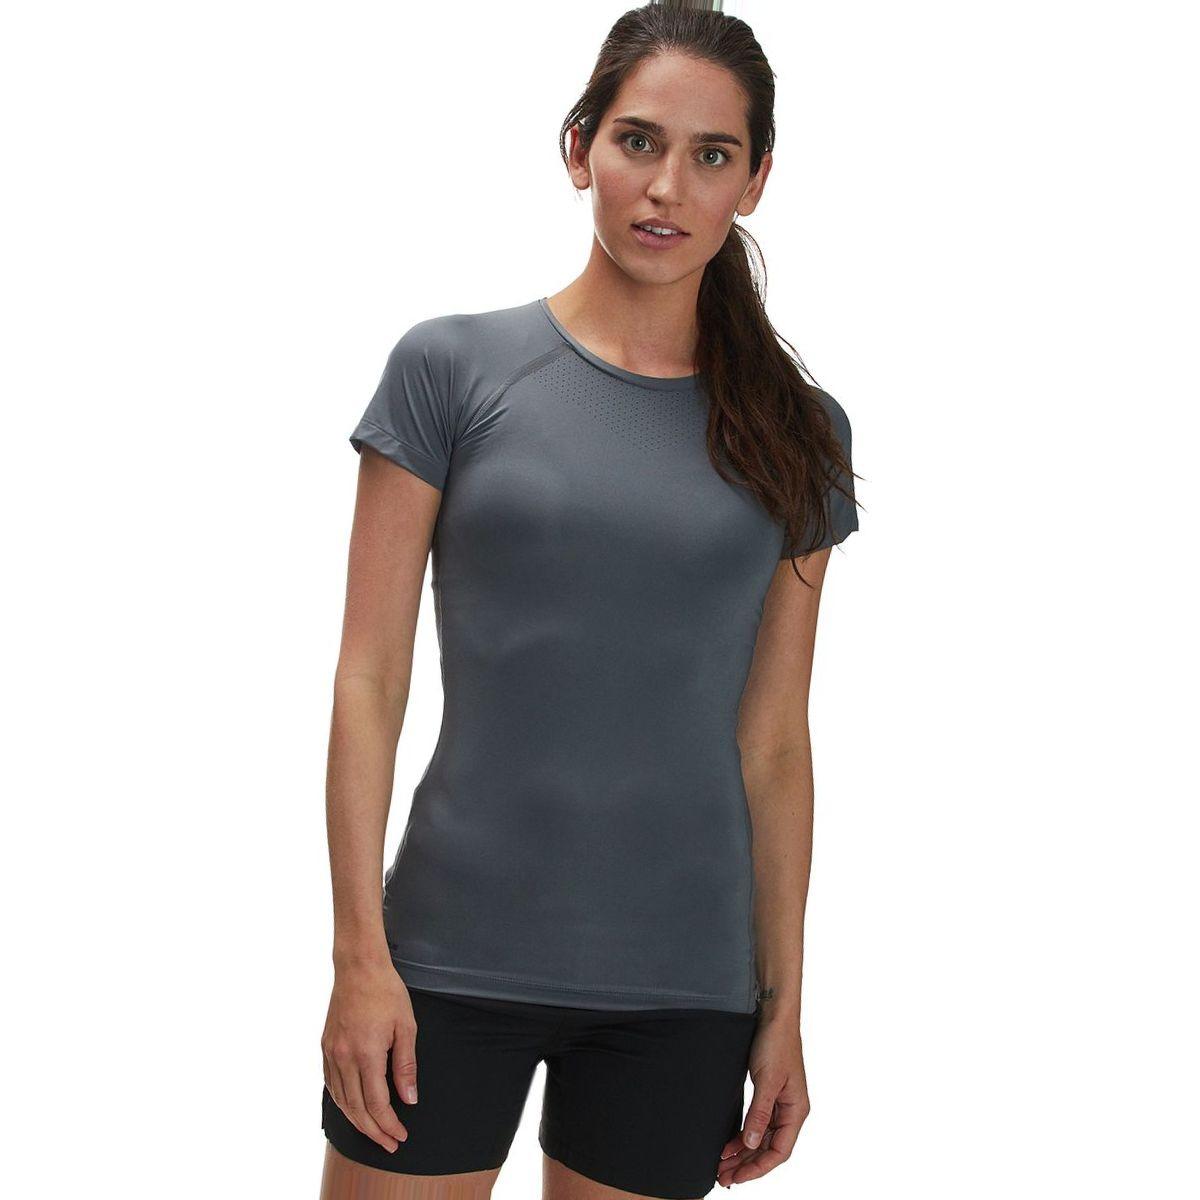 BLACKYAK Sardo Short-Sleeve Shirt - Women's